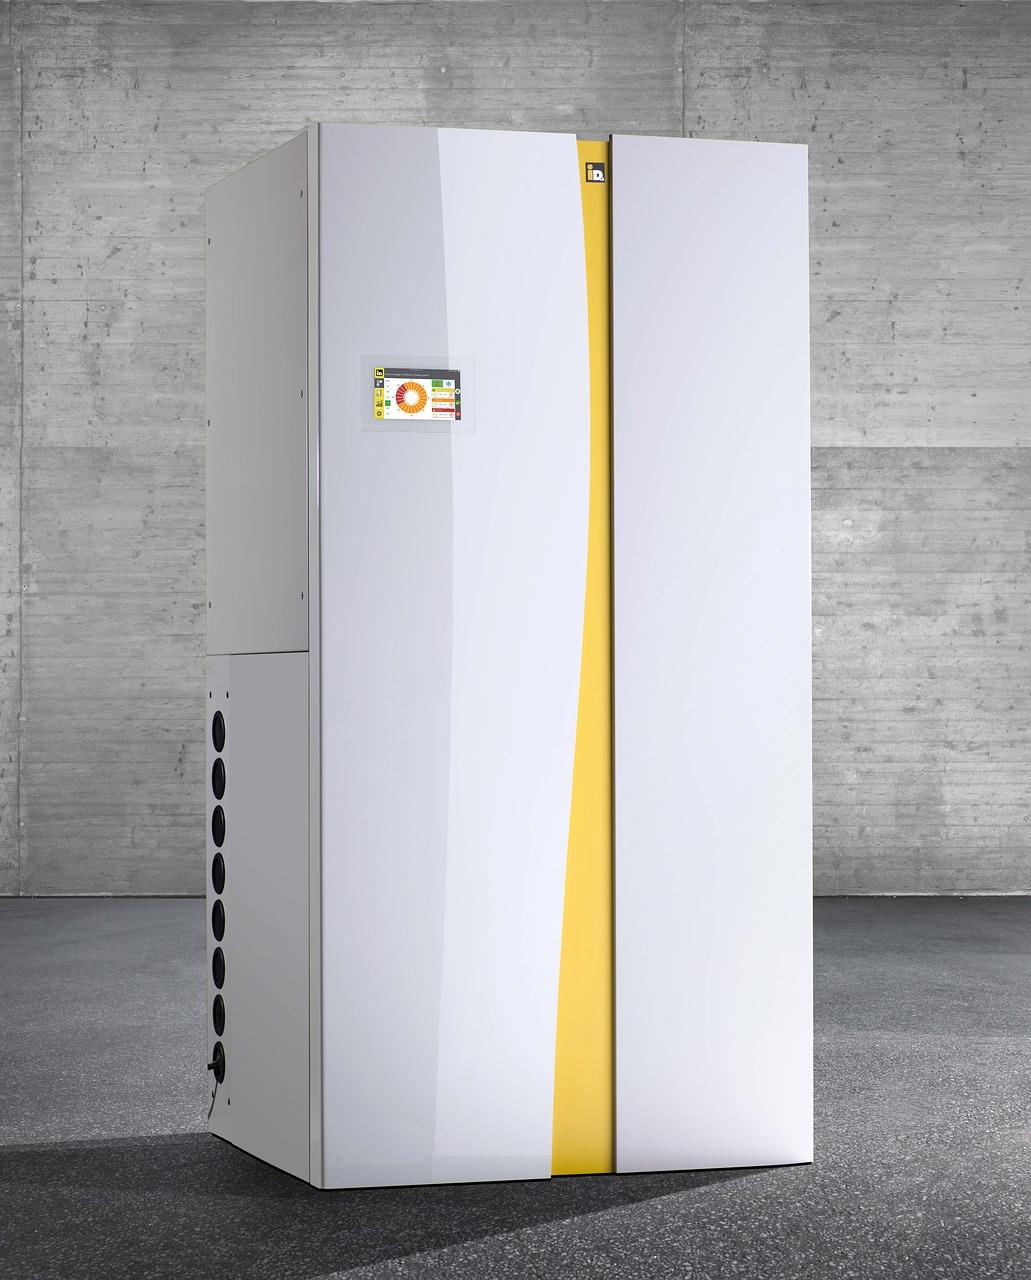 heat pump 2904633 1280